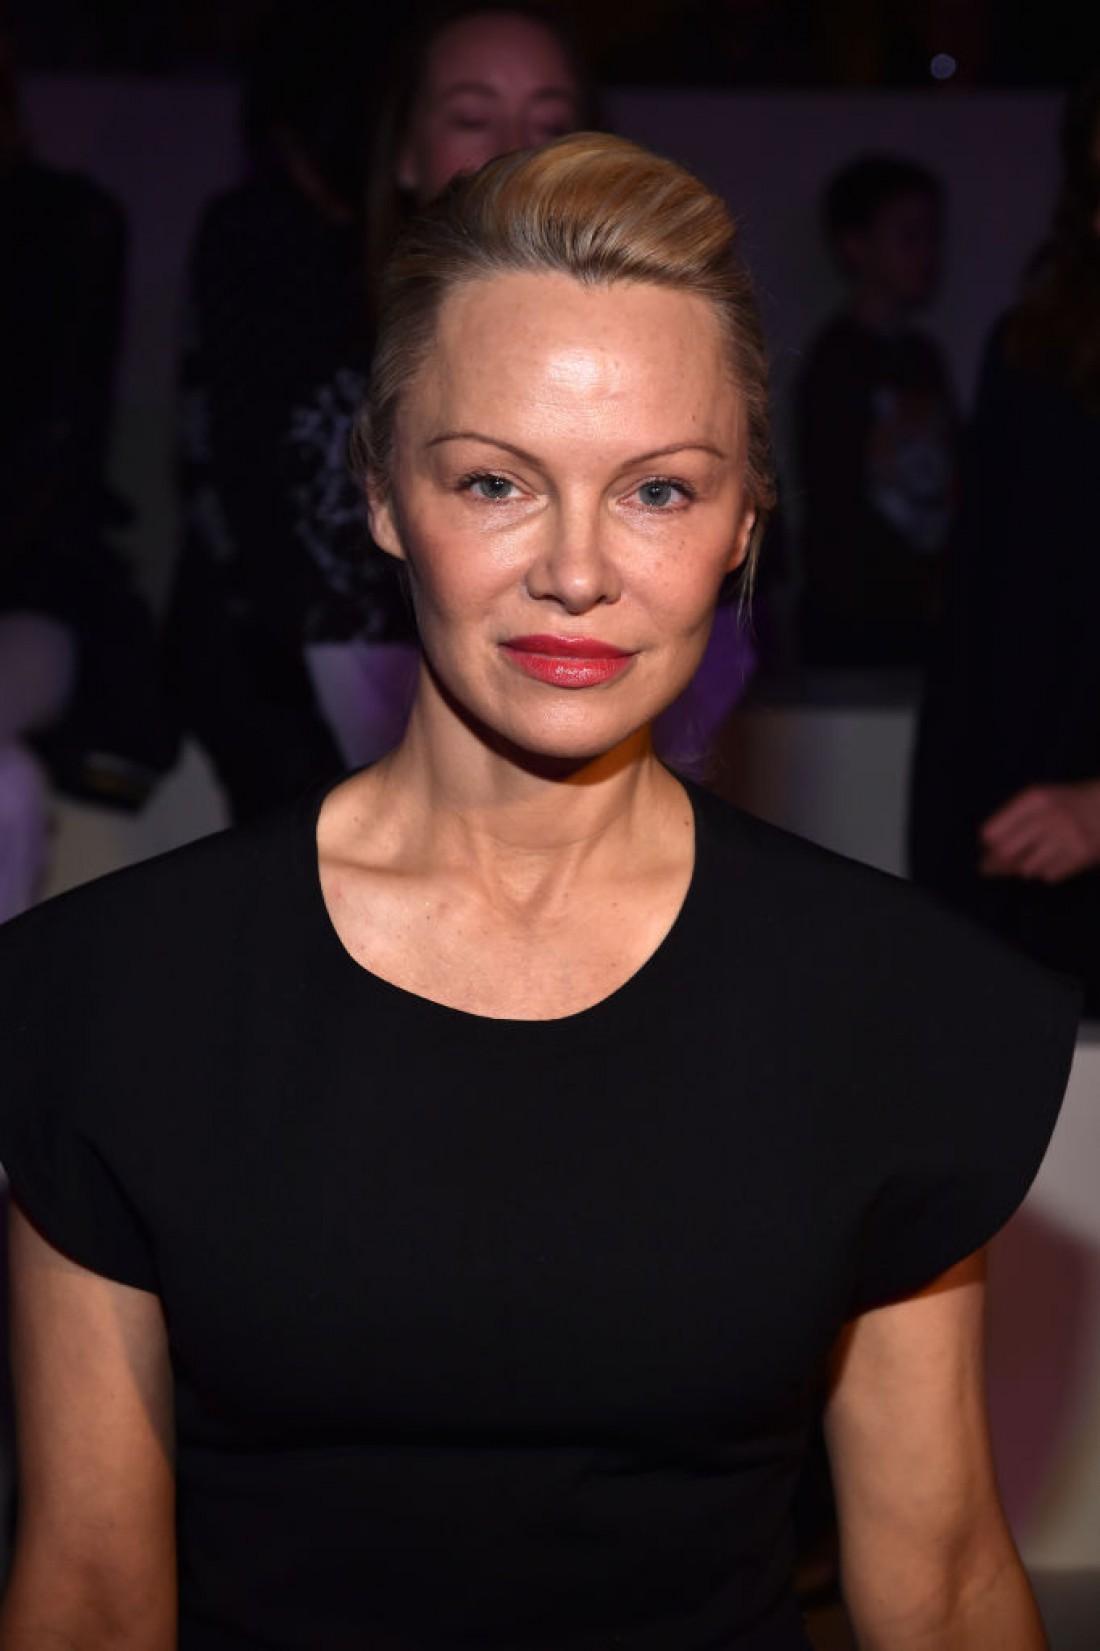 На парижском показе мод Памела Андерсон появилась без макияжа